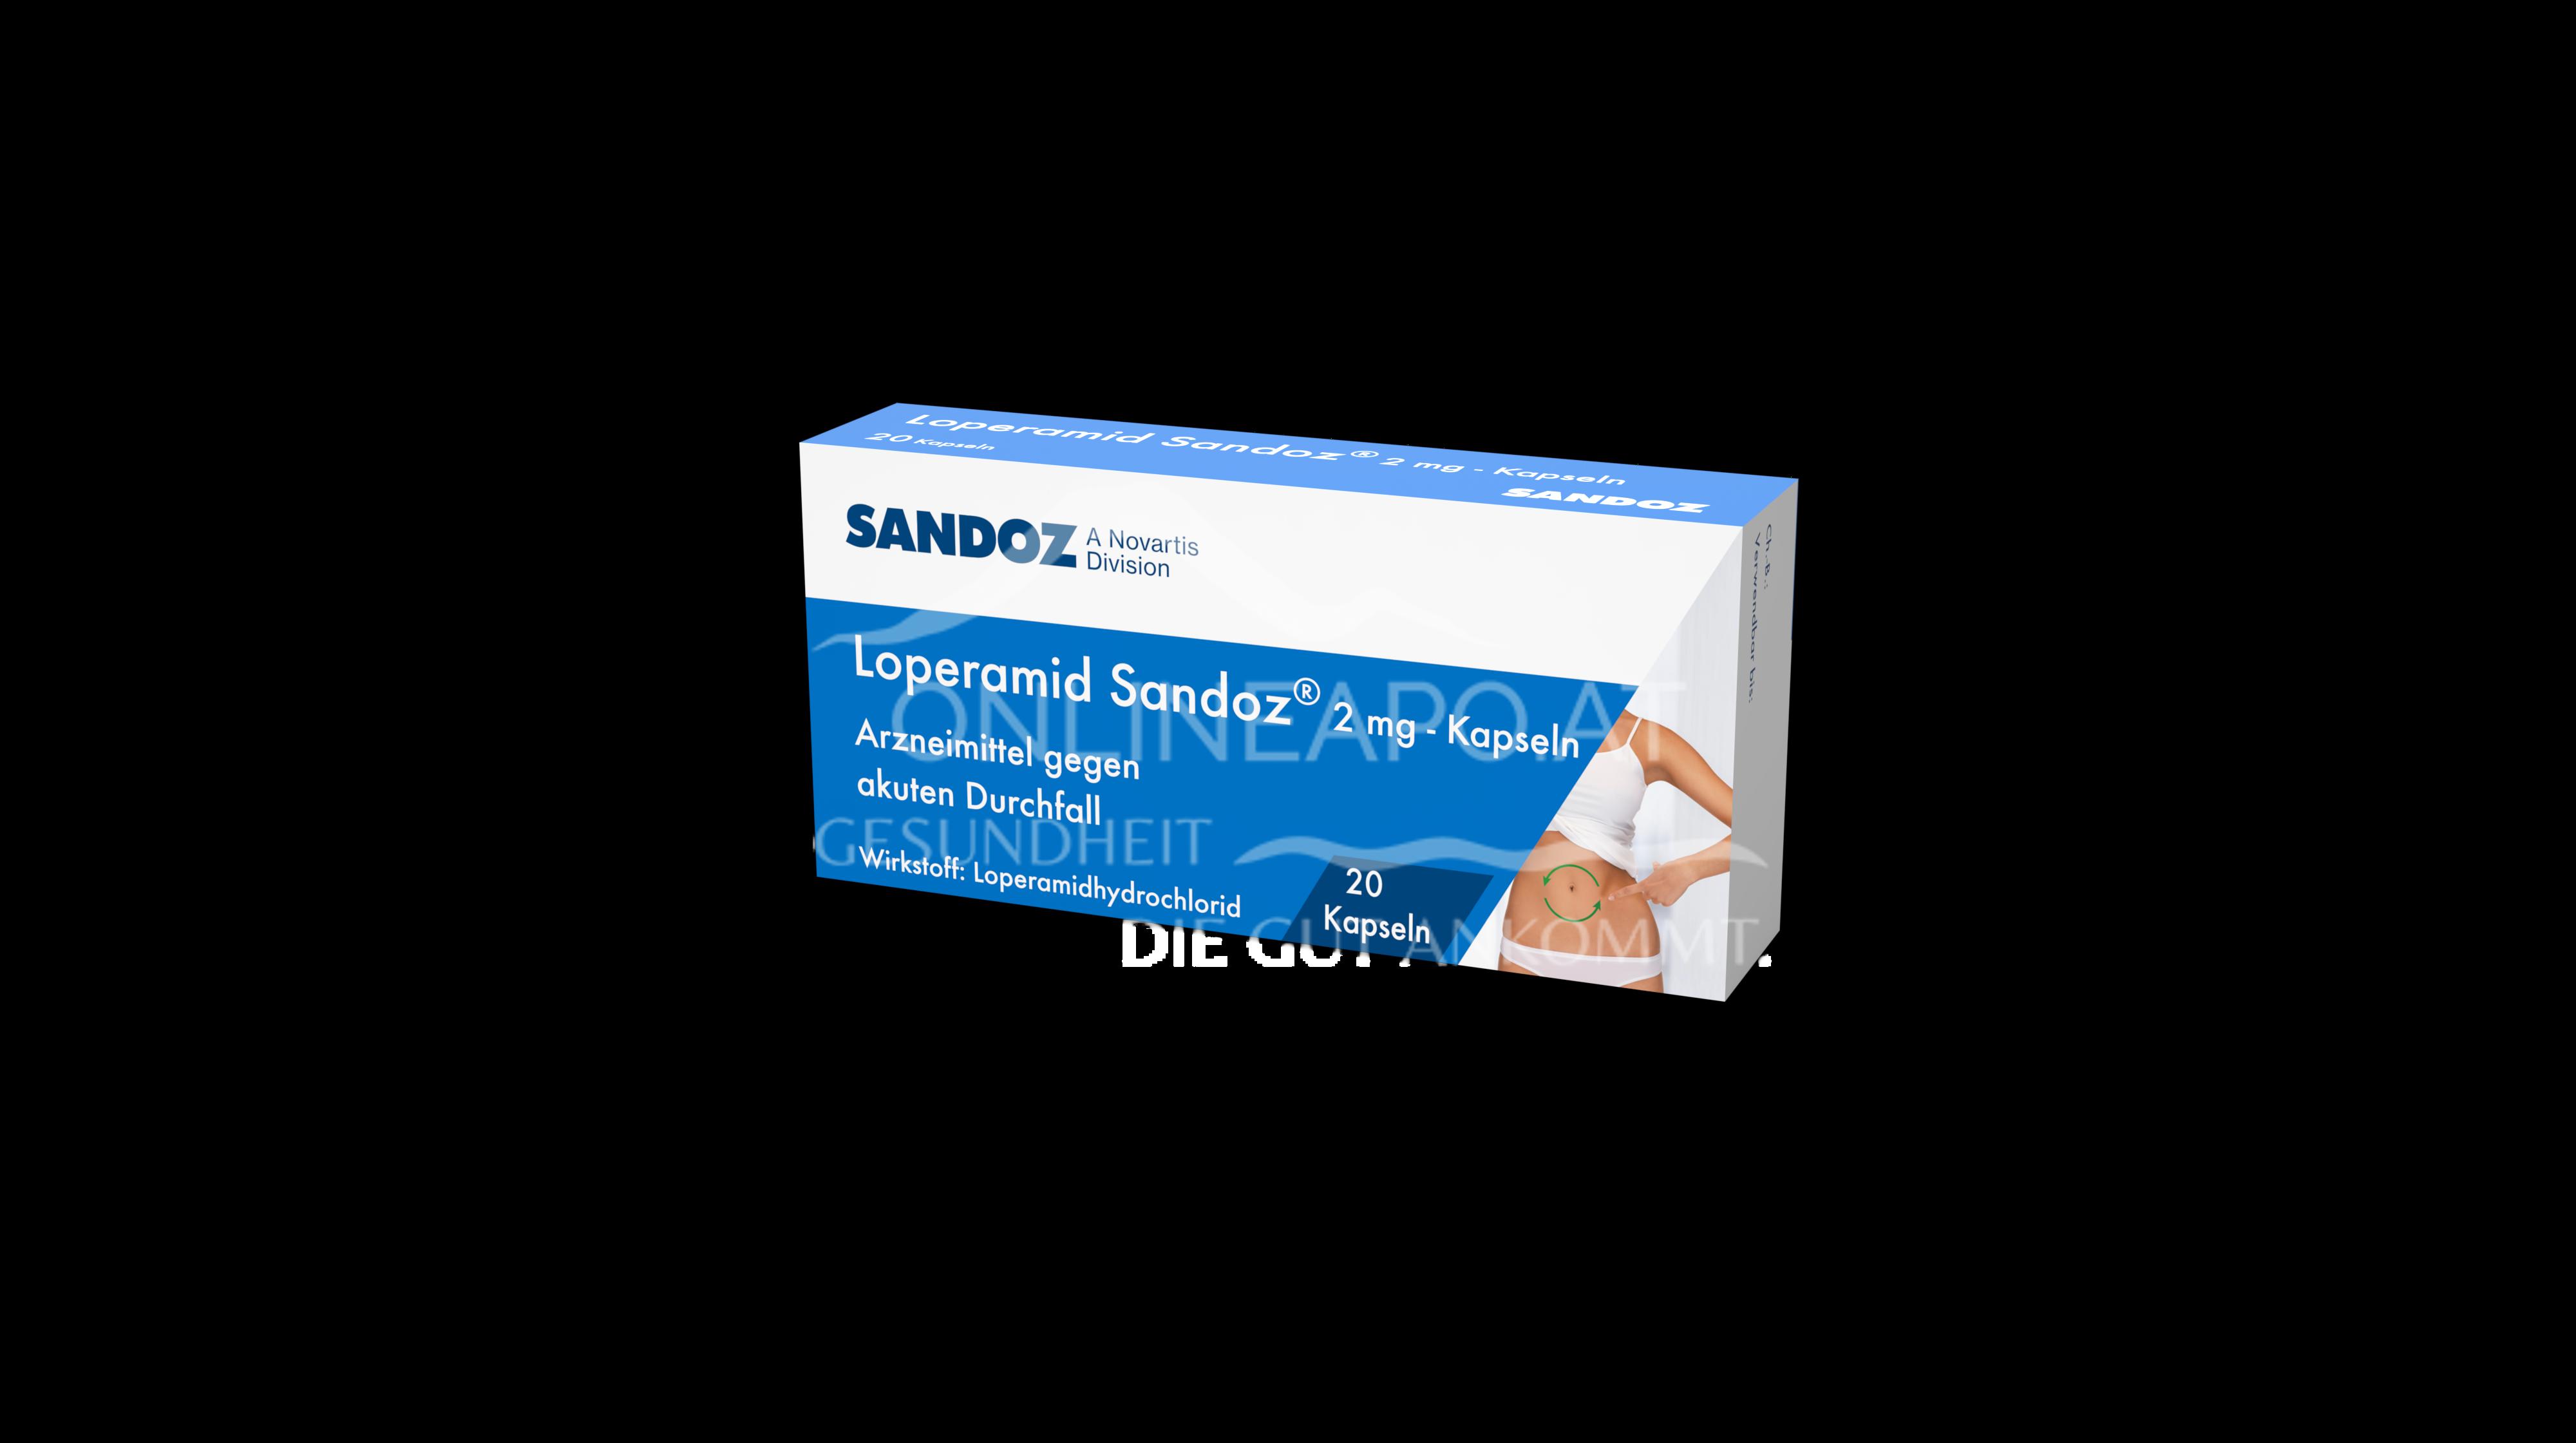 Loperamid Sandoz® 2mg Kapseln